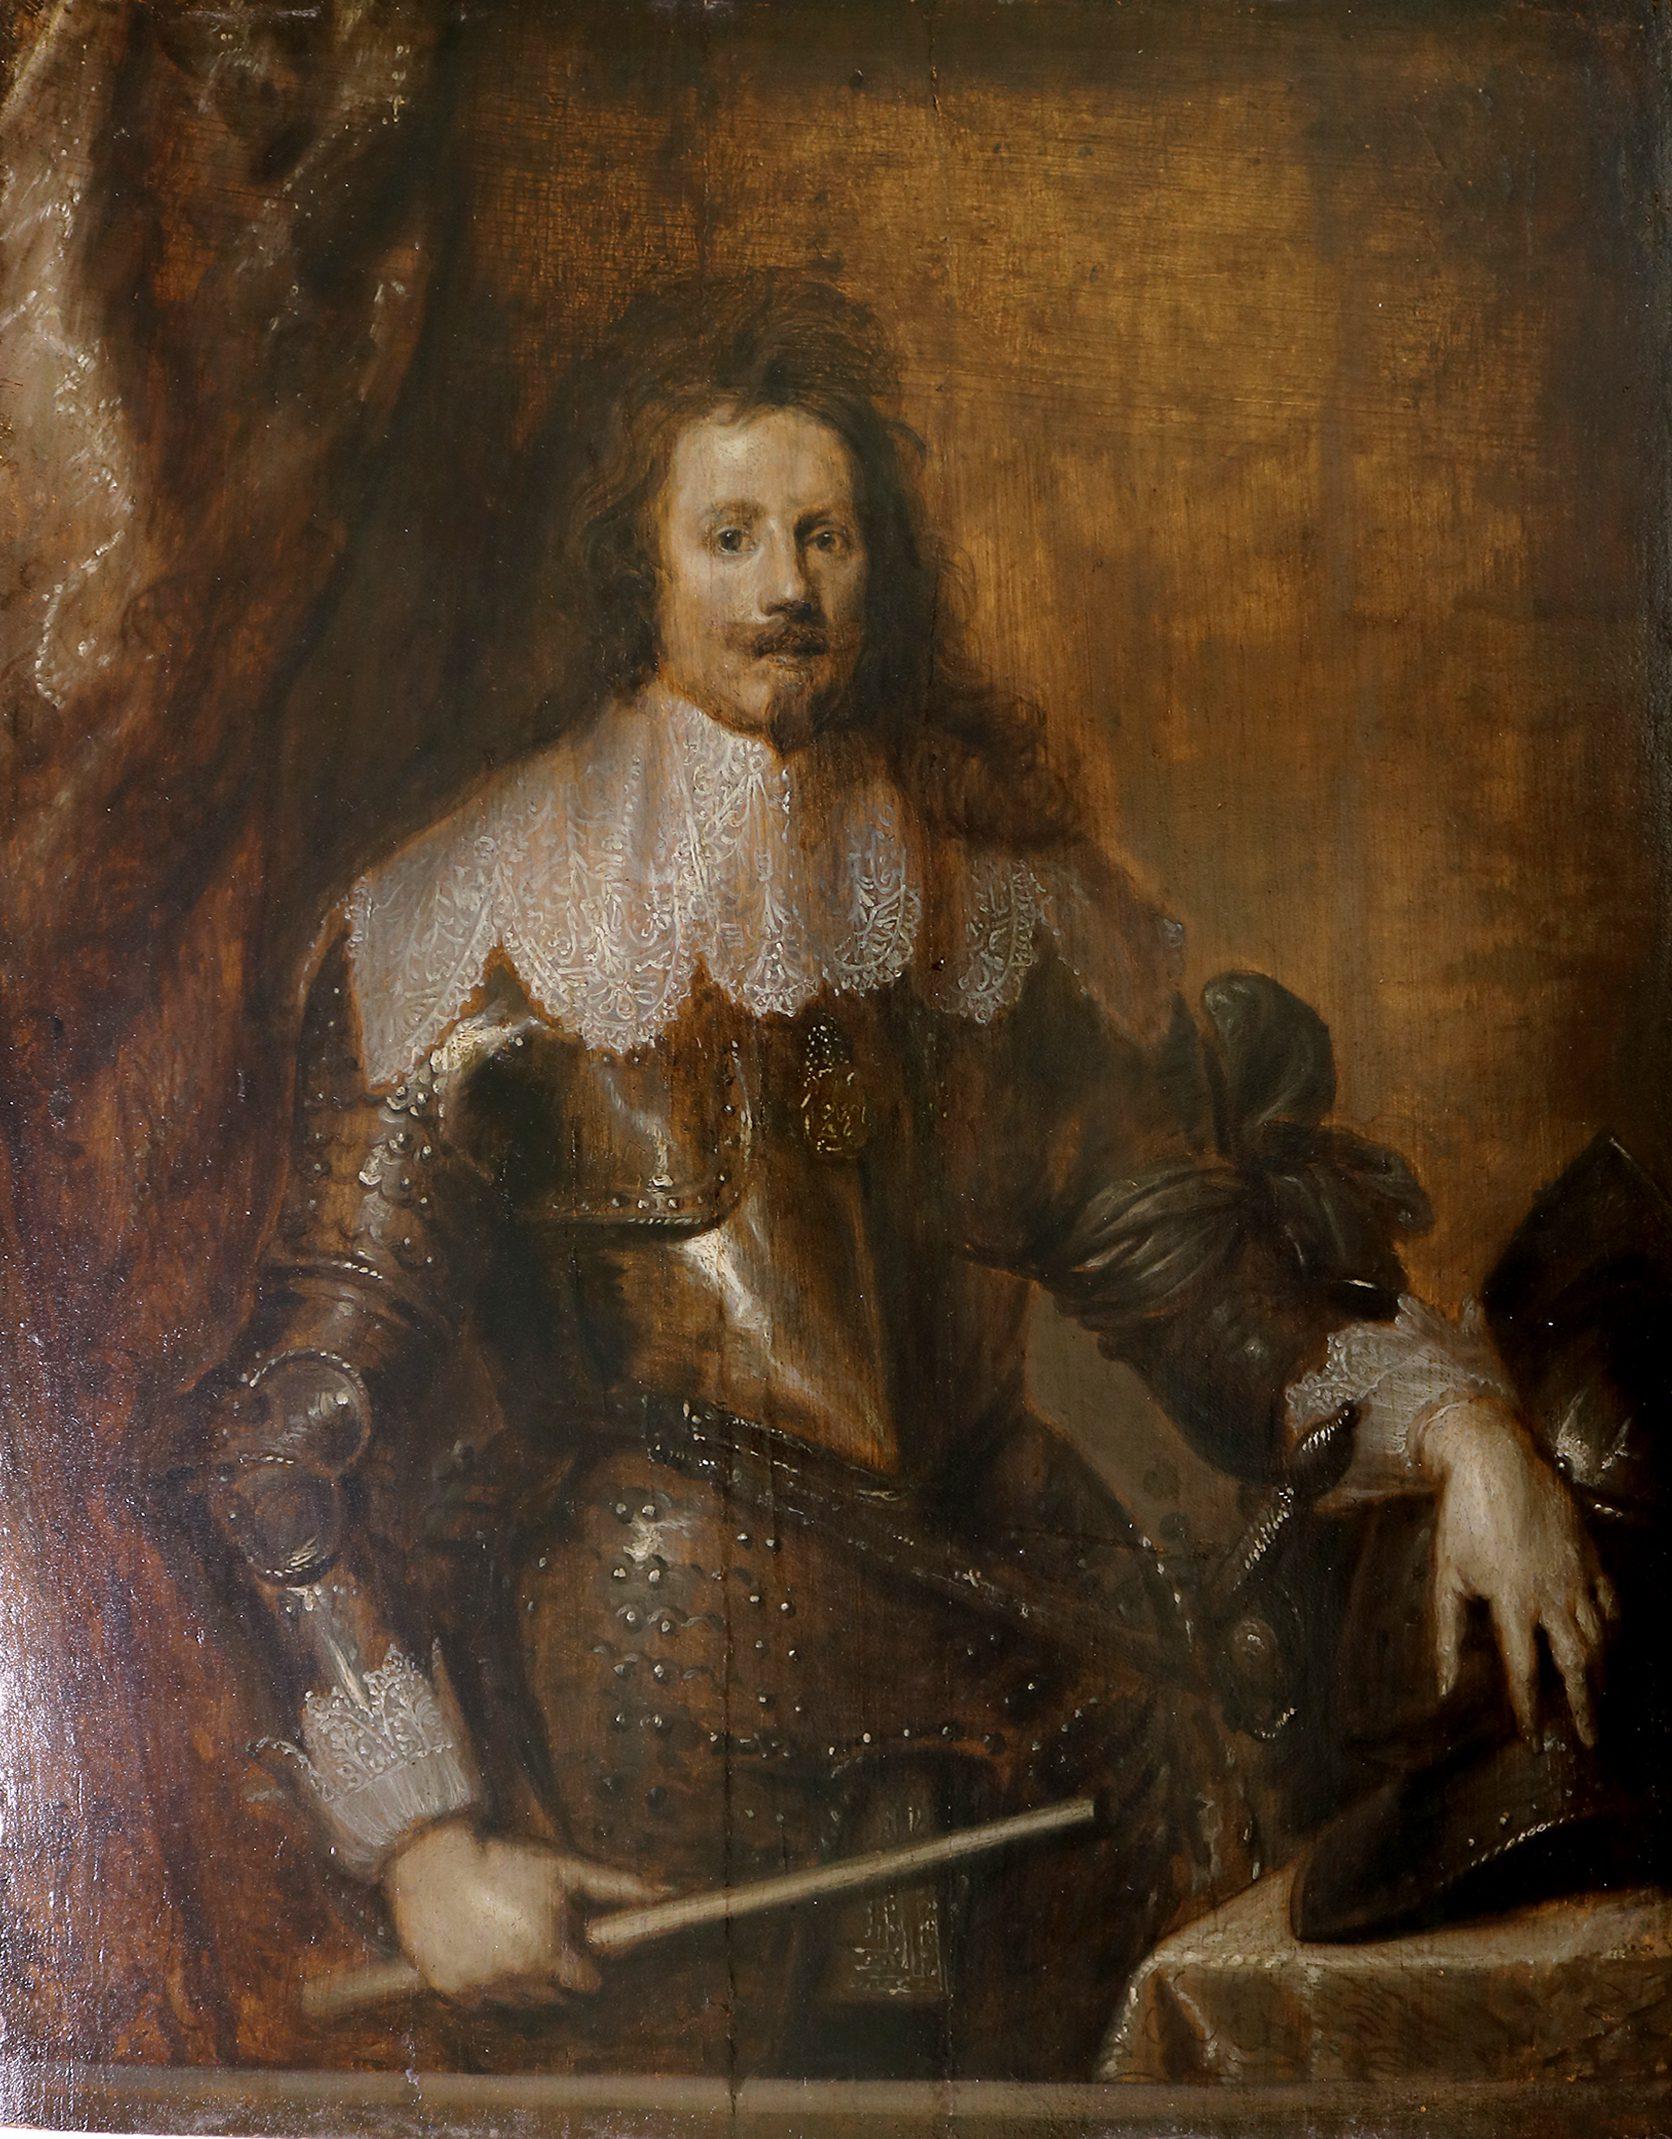 Portrait of Thomas François de Carignan (Prince of Savoy)